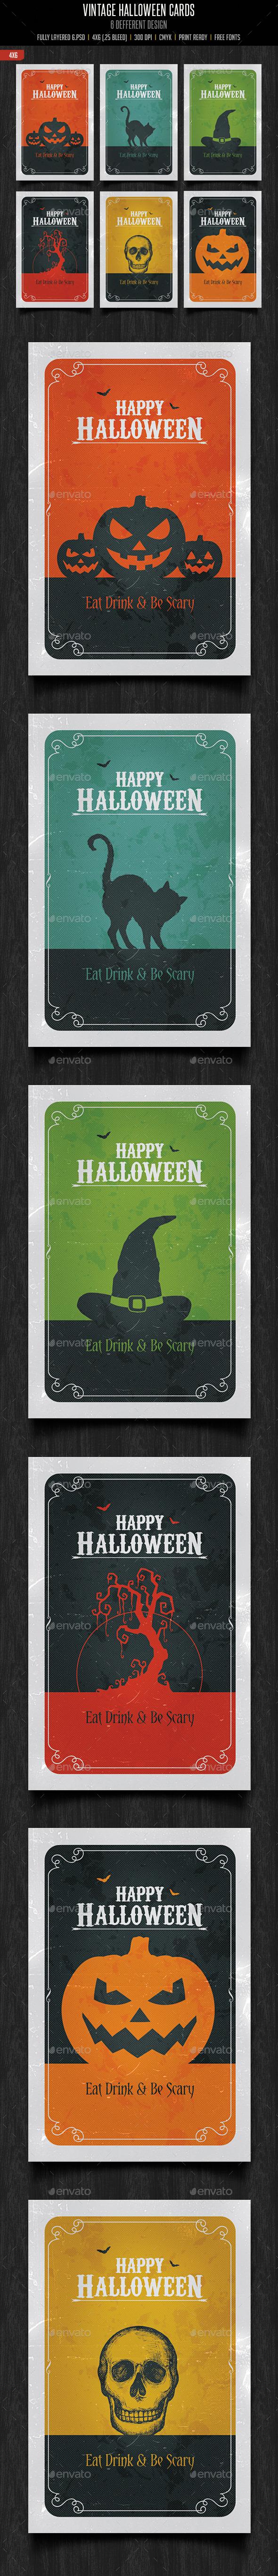 Vintage Halloween Cards - Cards & Invites Print Templates